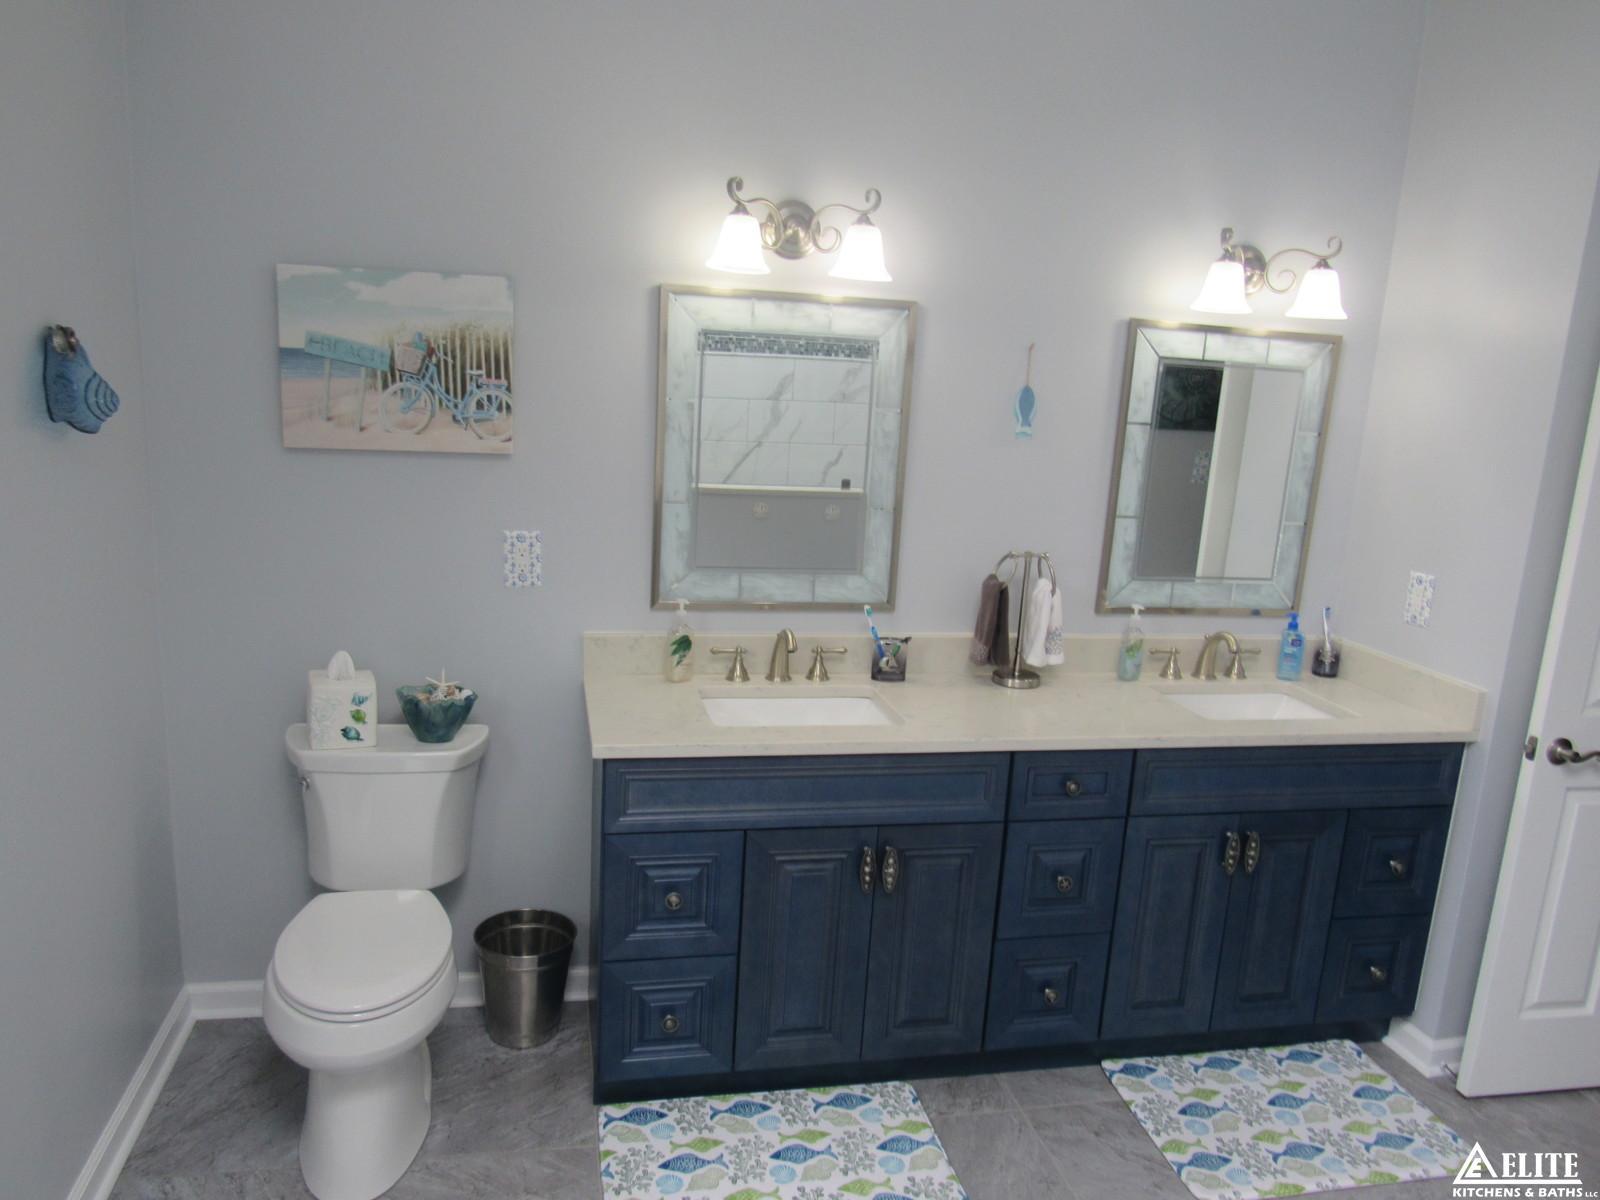 Bathrooms 98